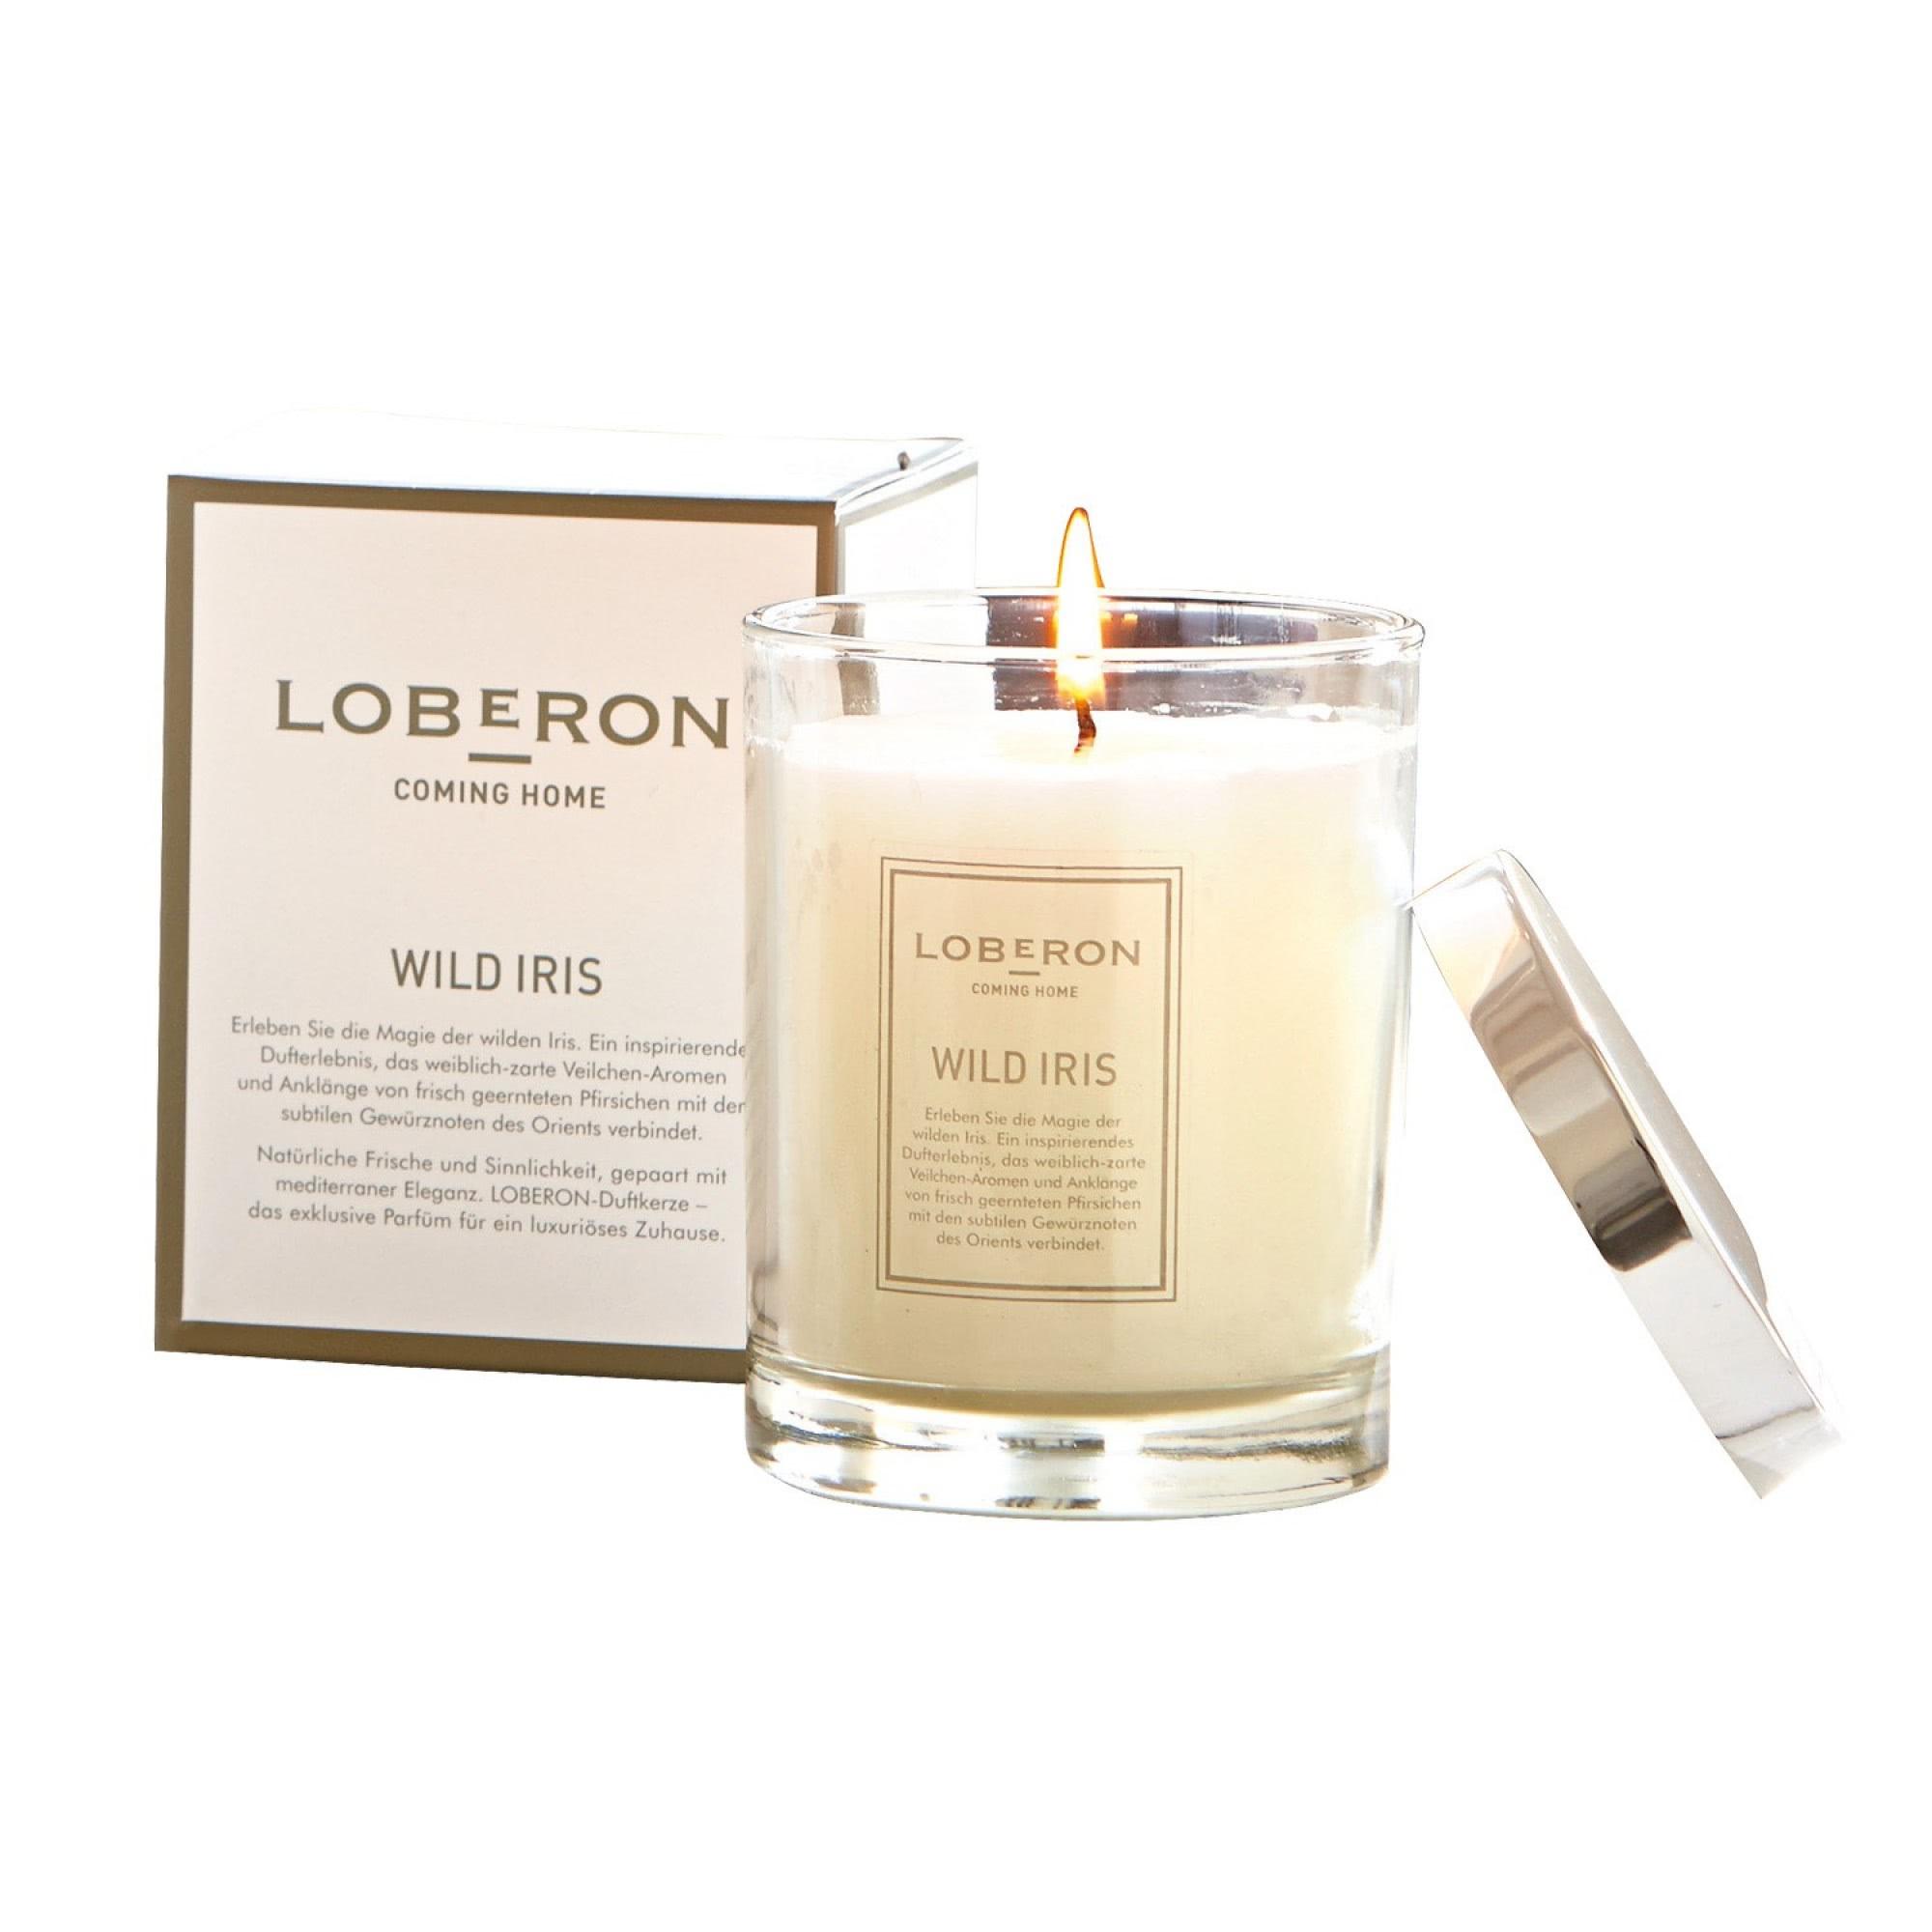 duftkerze wild iris loberon coming home. Black Bedroom Furniture Sets. Home Design Ideas